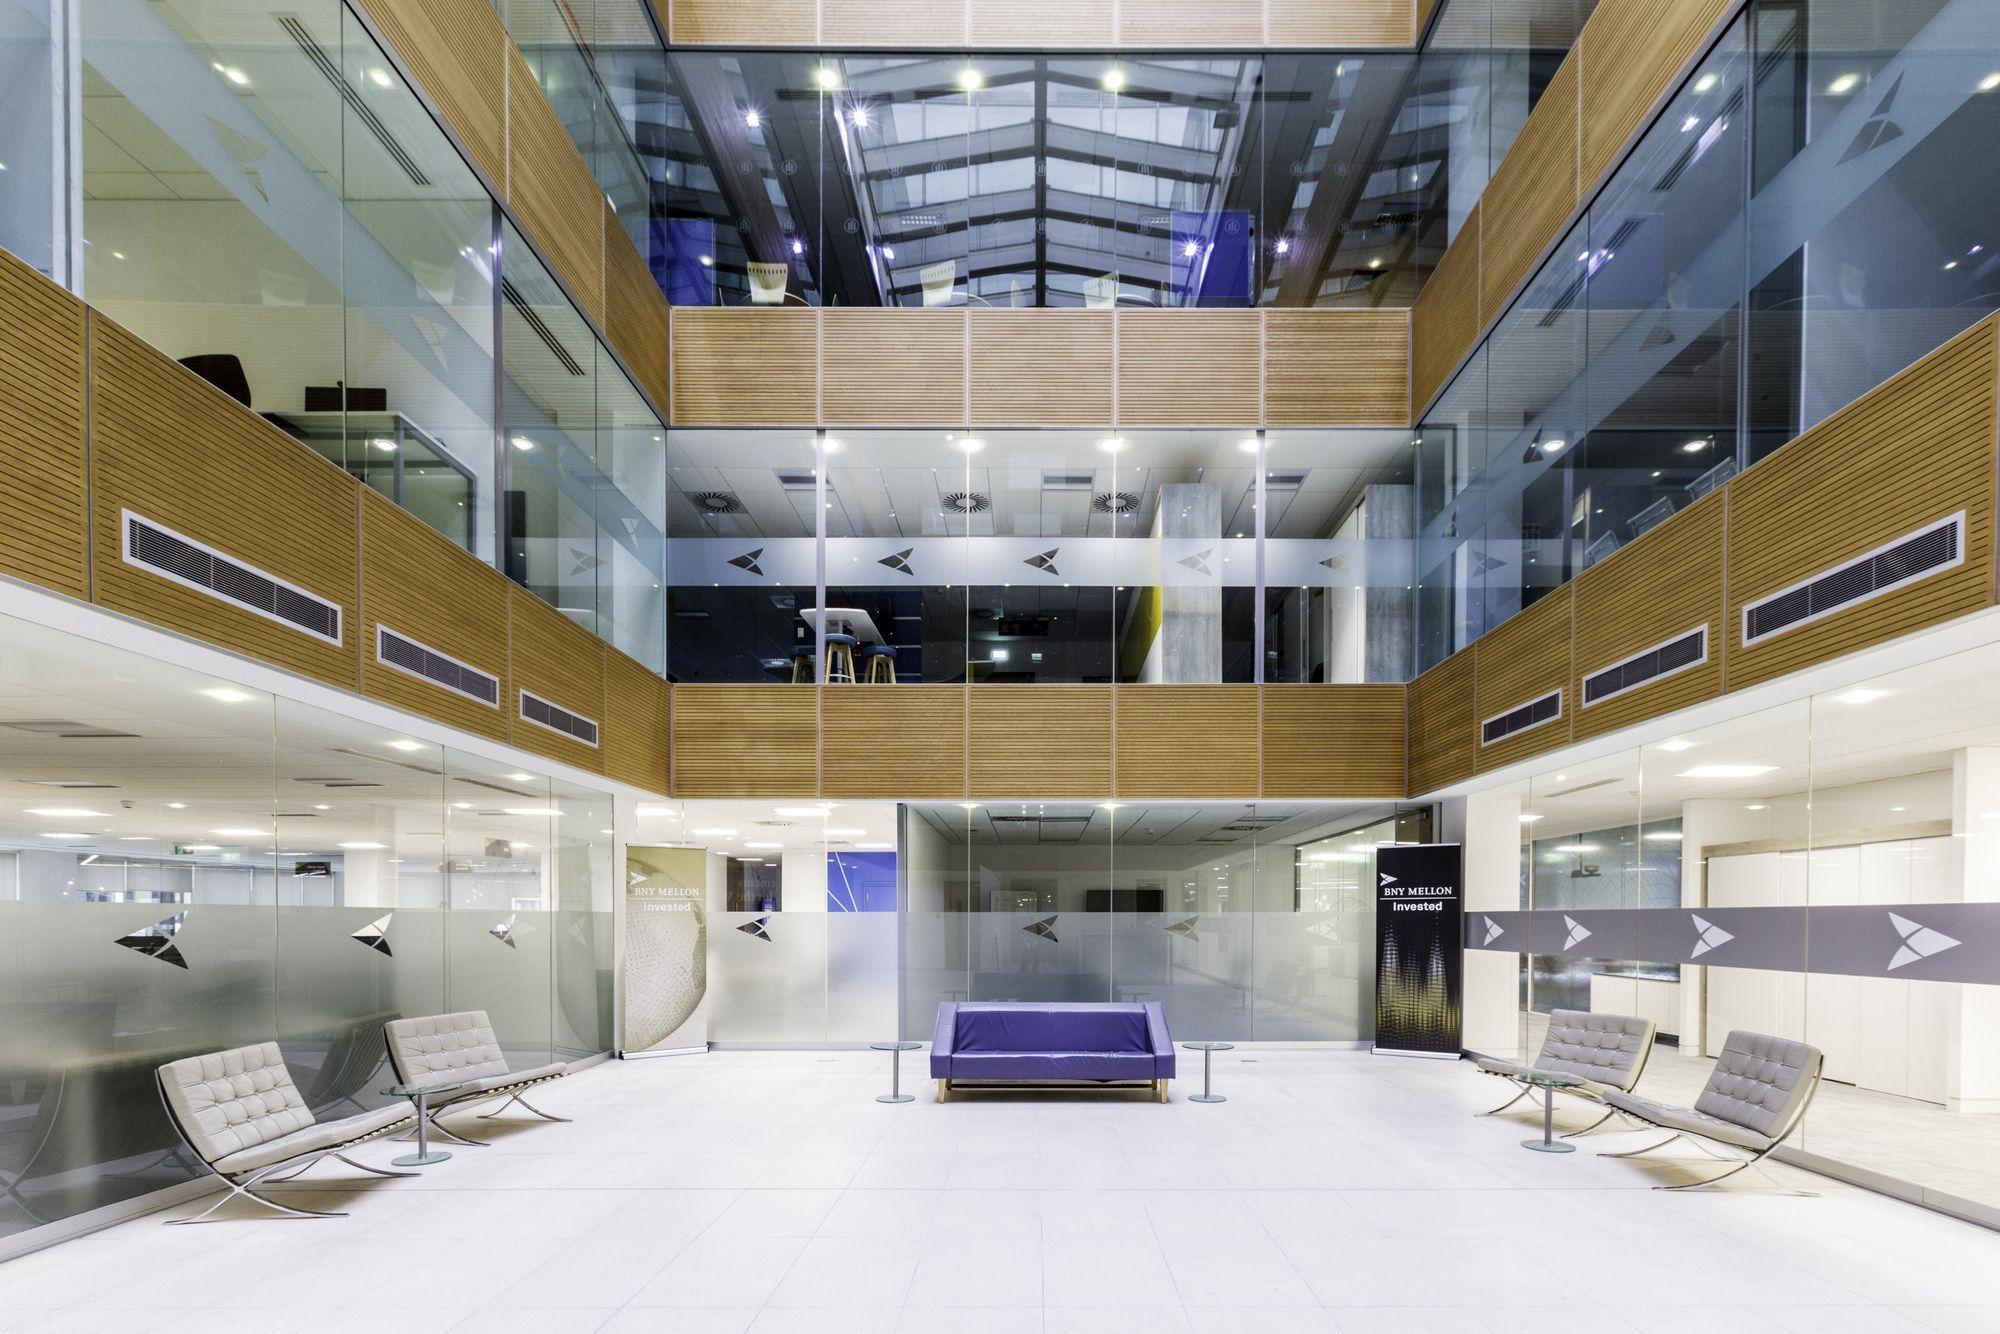 Bank Of New York Mellon Offices Manchester Office Snapshots Modular Lounges Office Interiors Design